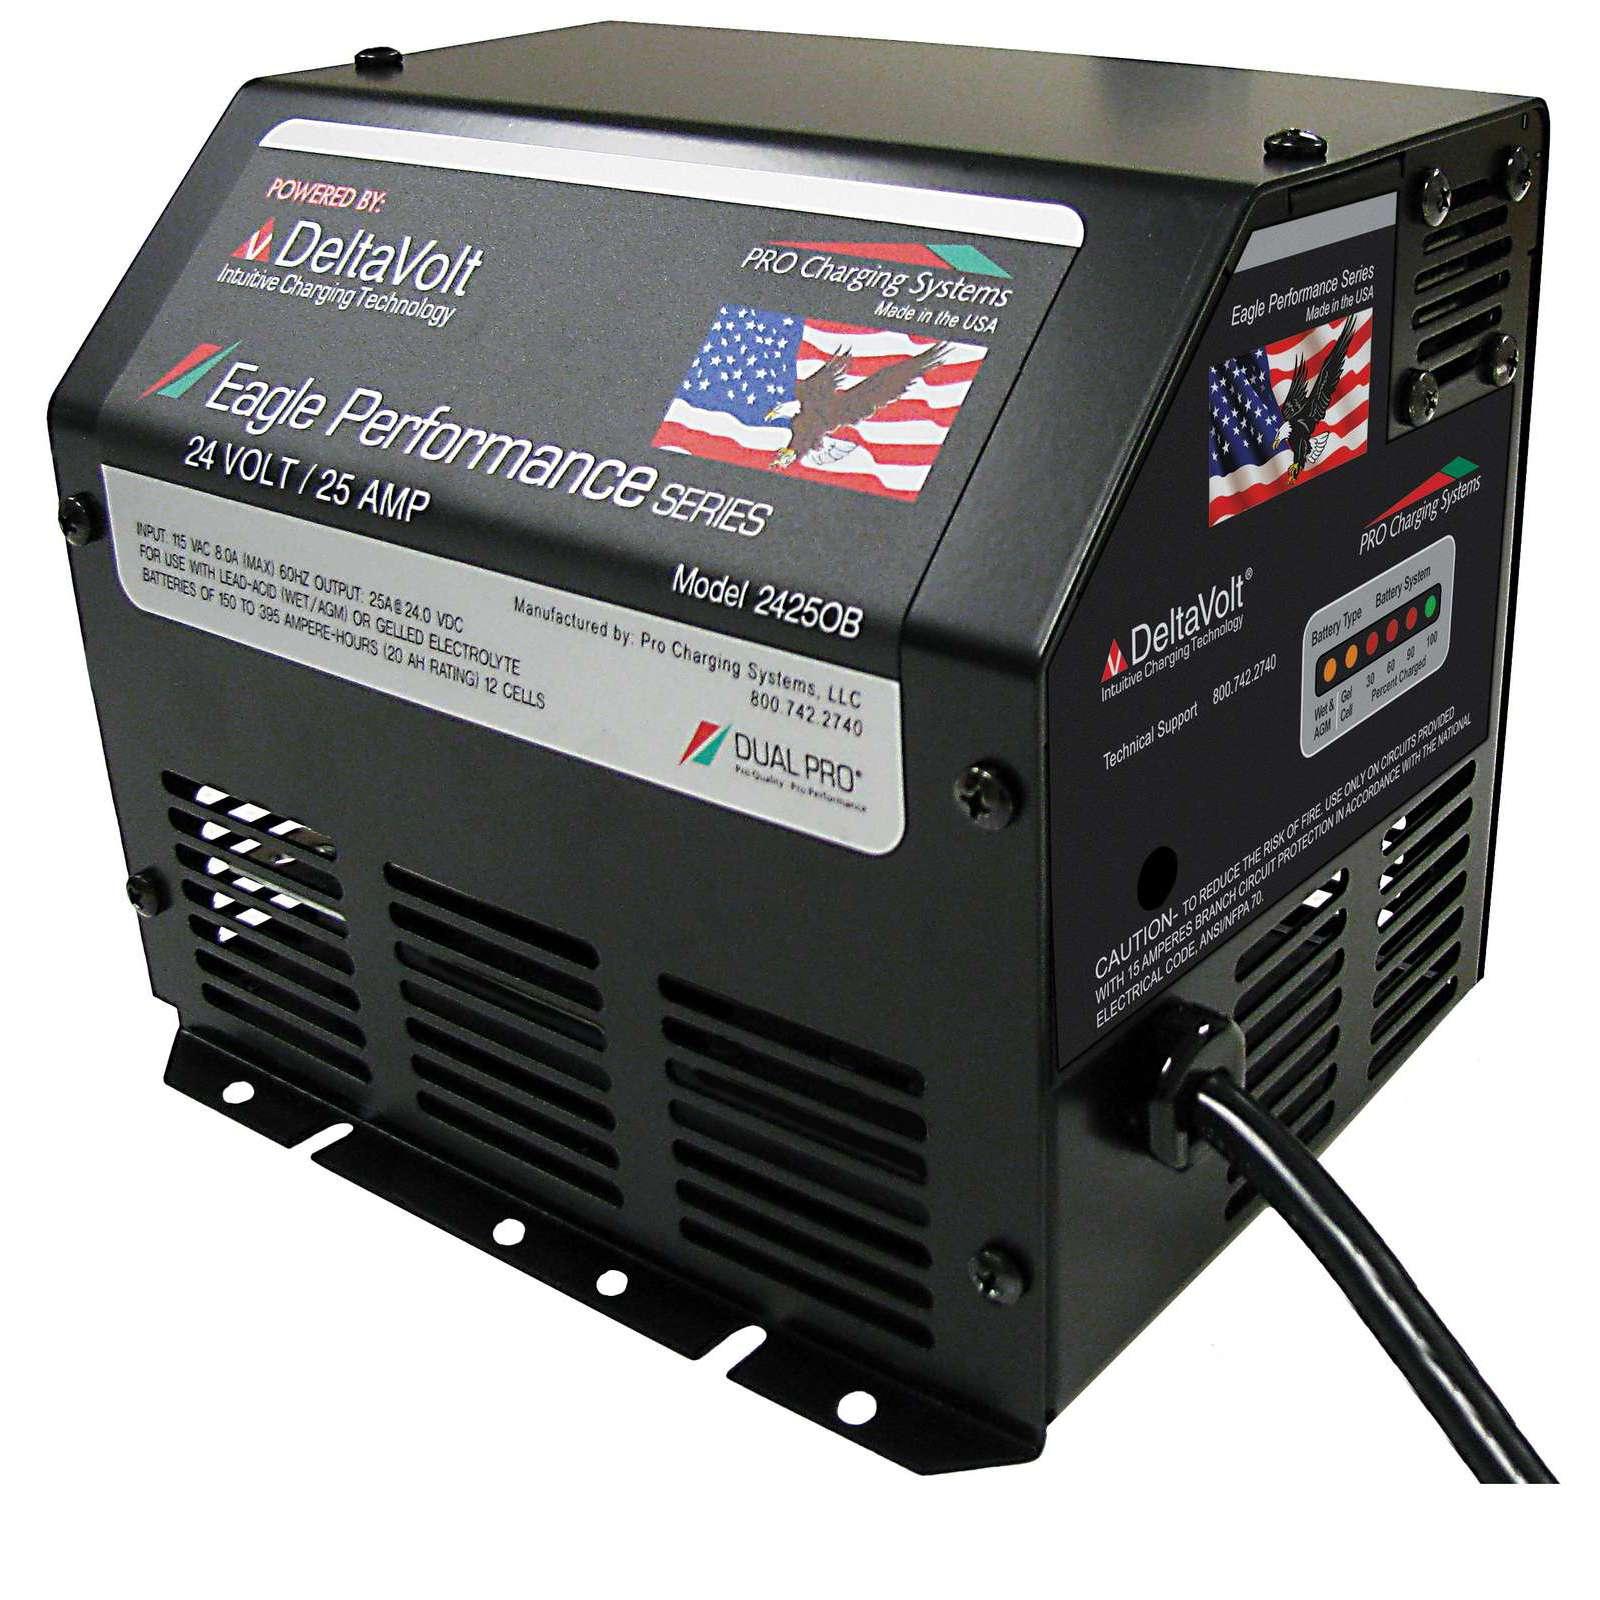 PRO Charging System i2425OBRMLIFT E.P.S. On-Board- Variou...